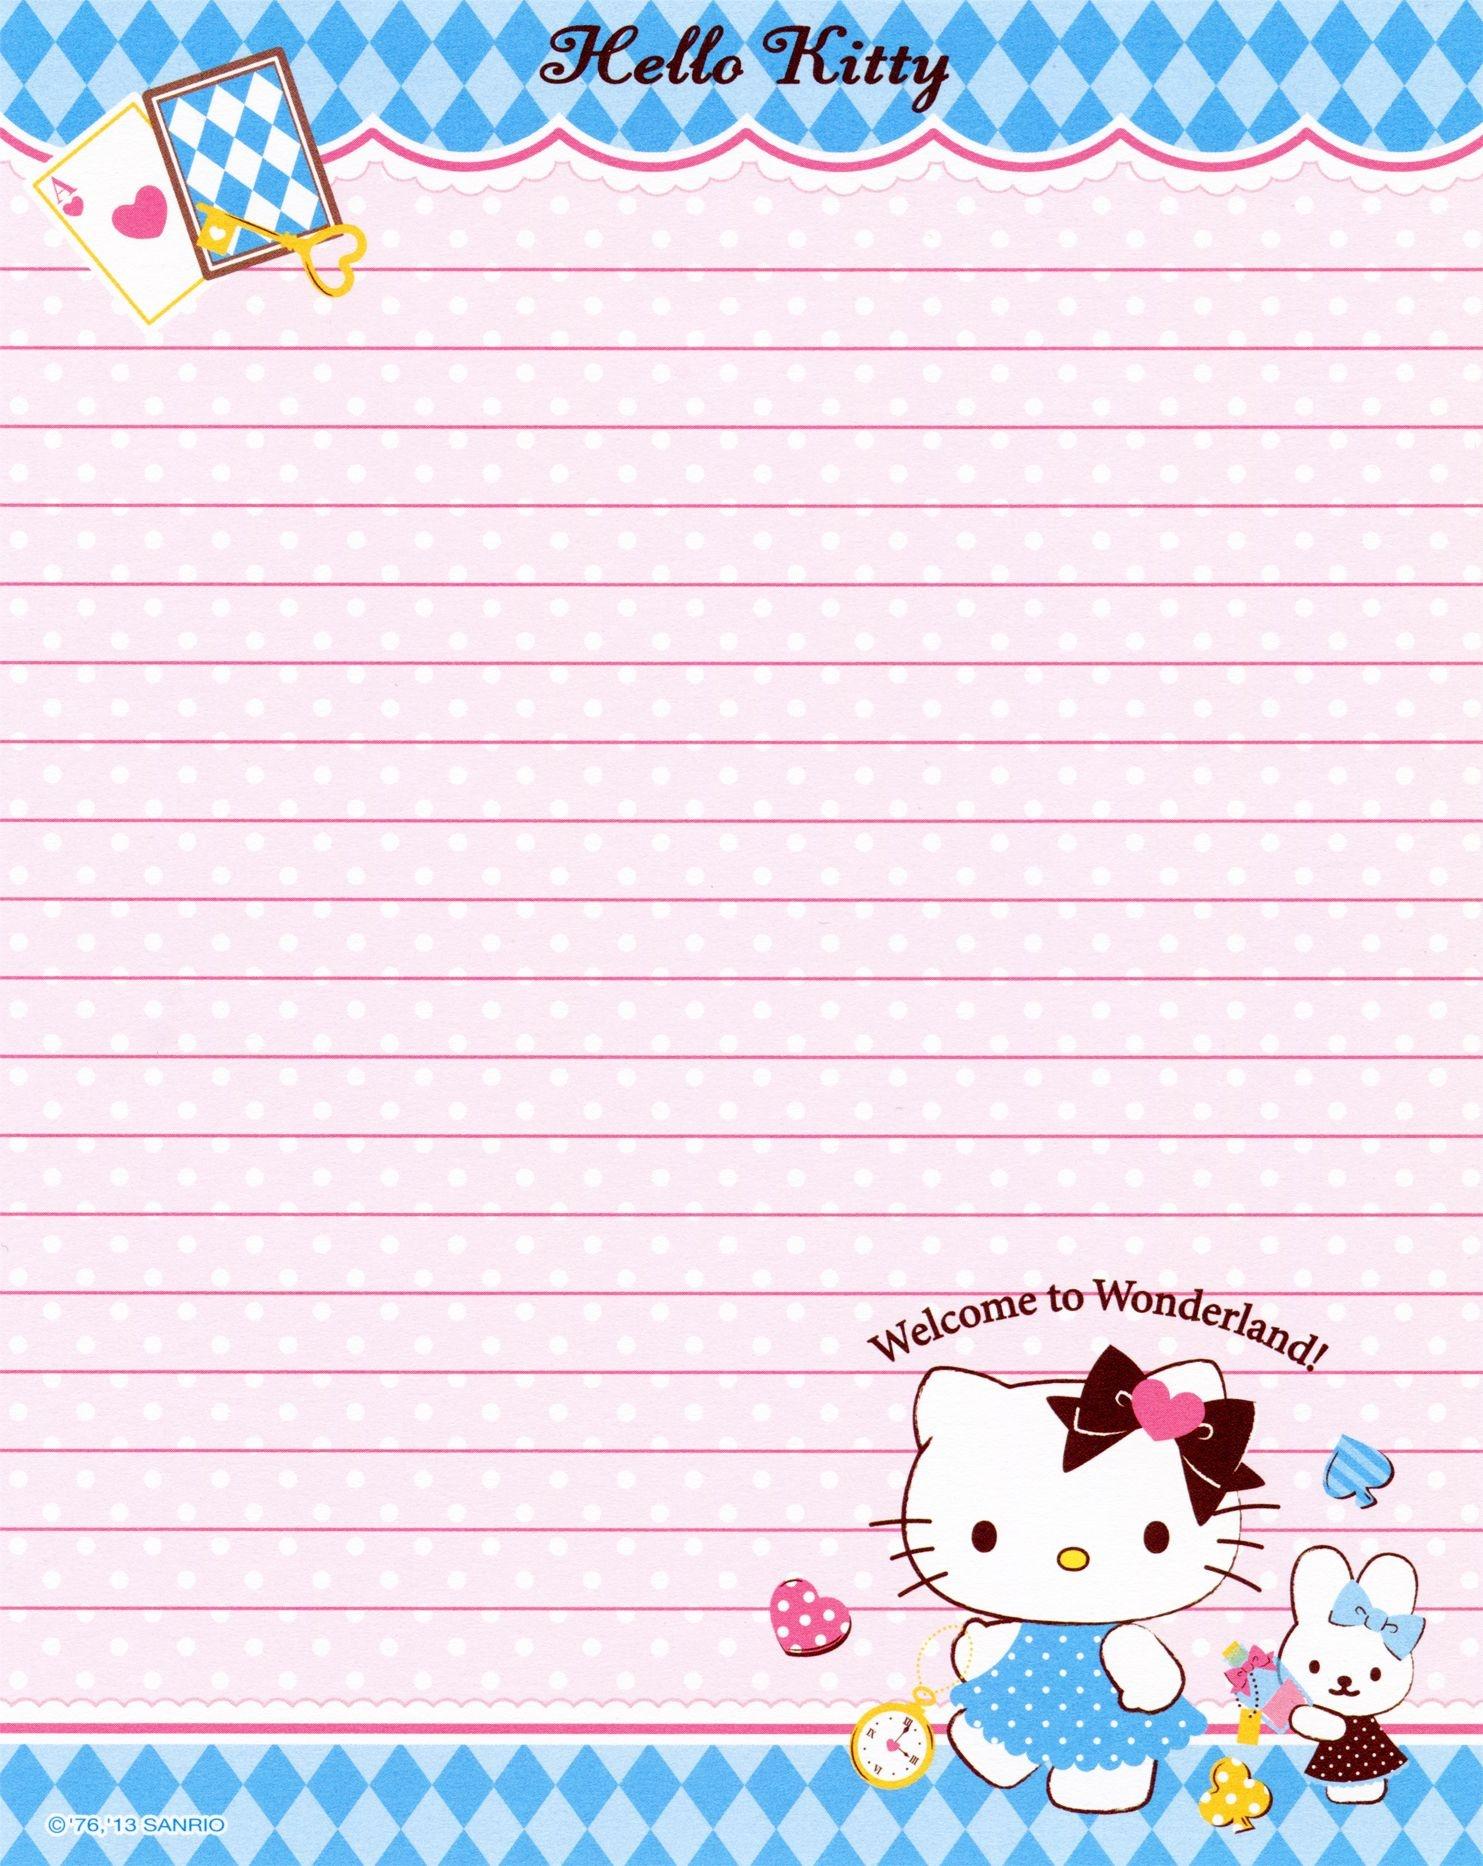 Sanrio - Hello Kitty - Memo Paper | Tags | Hello Kitty, Sanrio Hello - Free Printable Hello Kitty Stationery